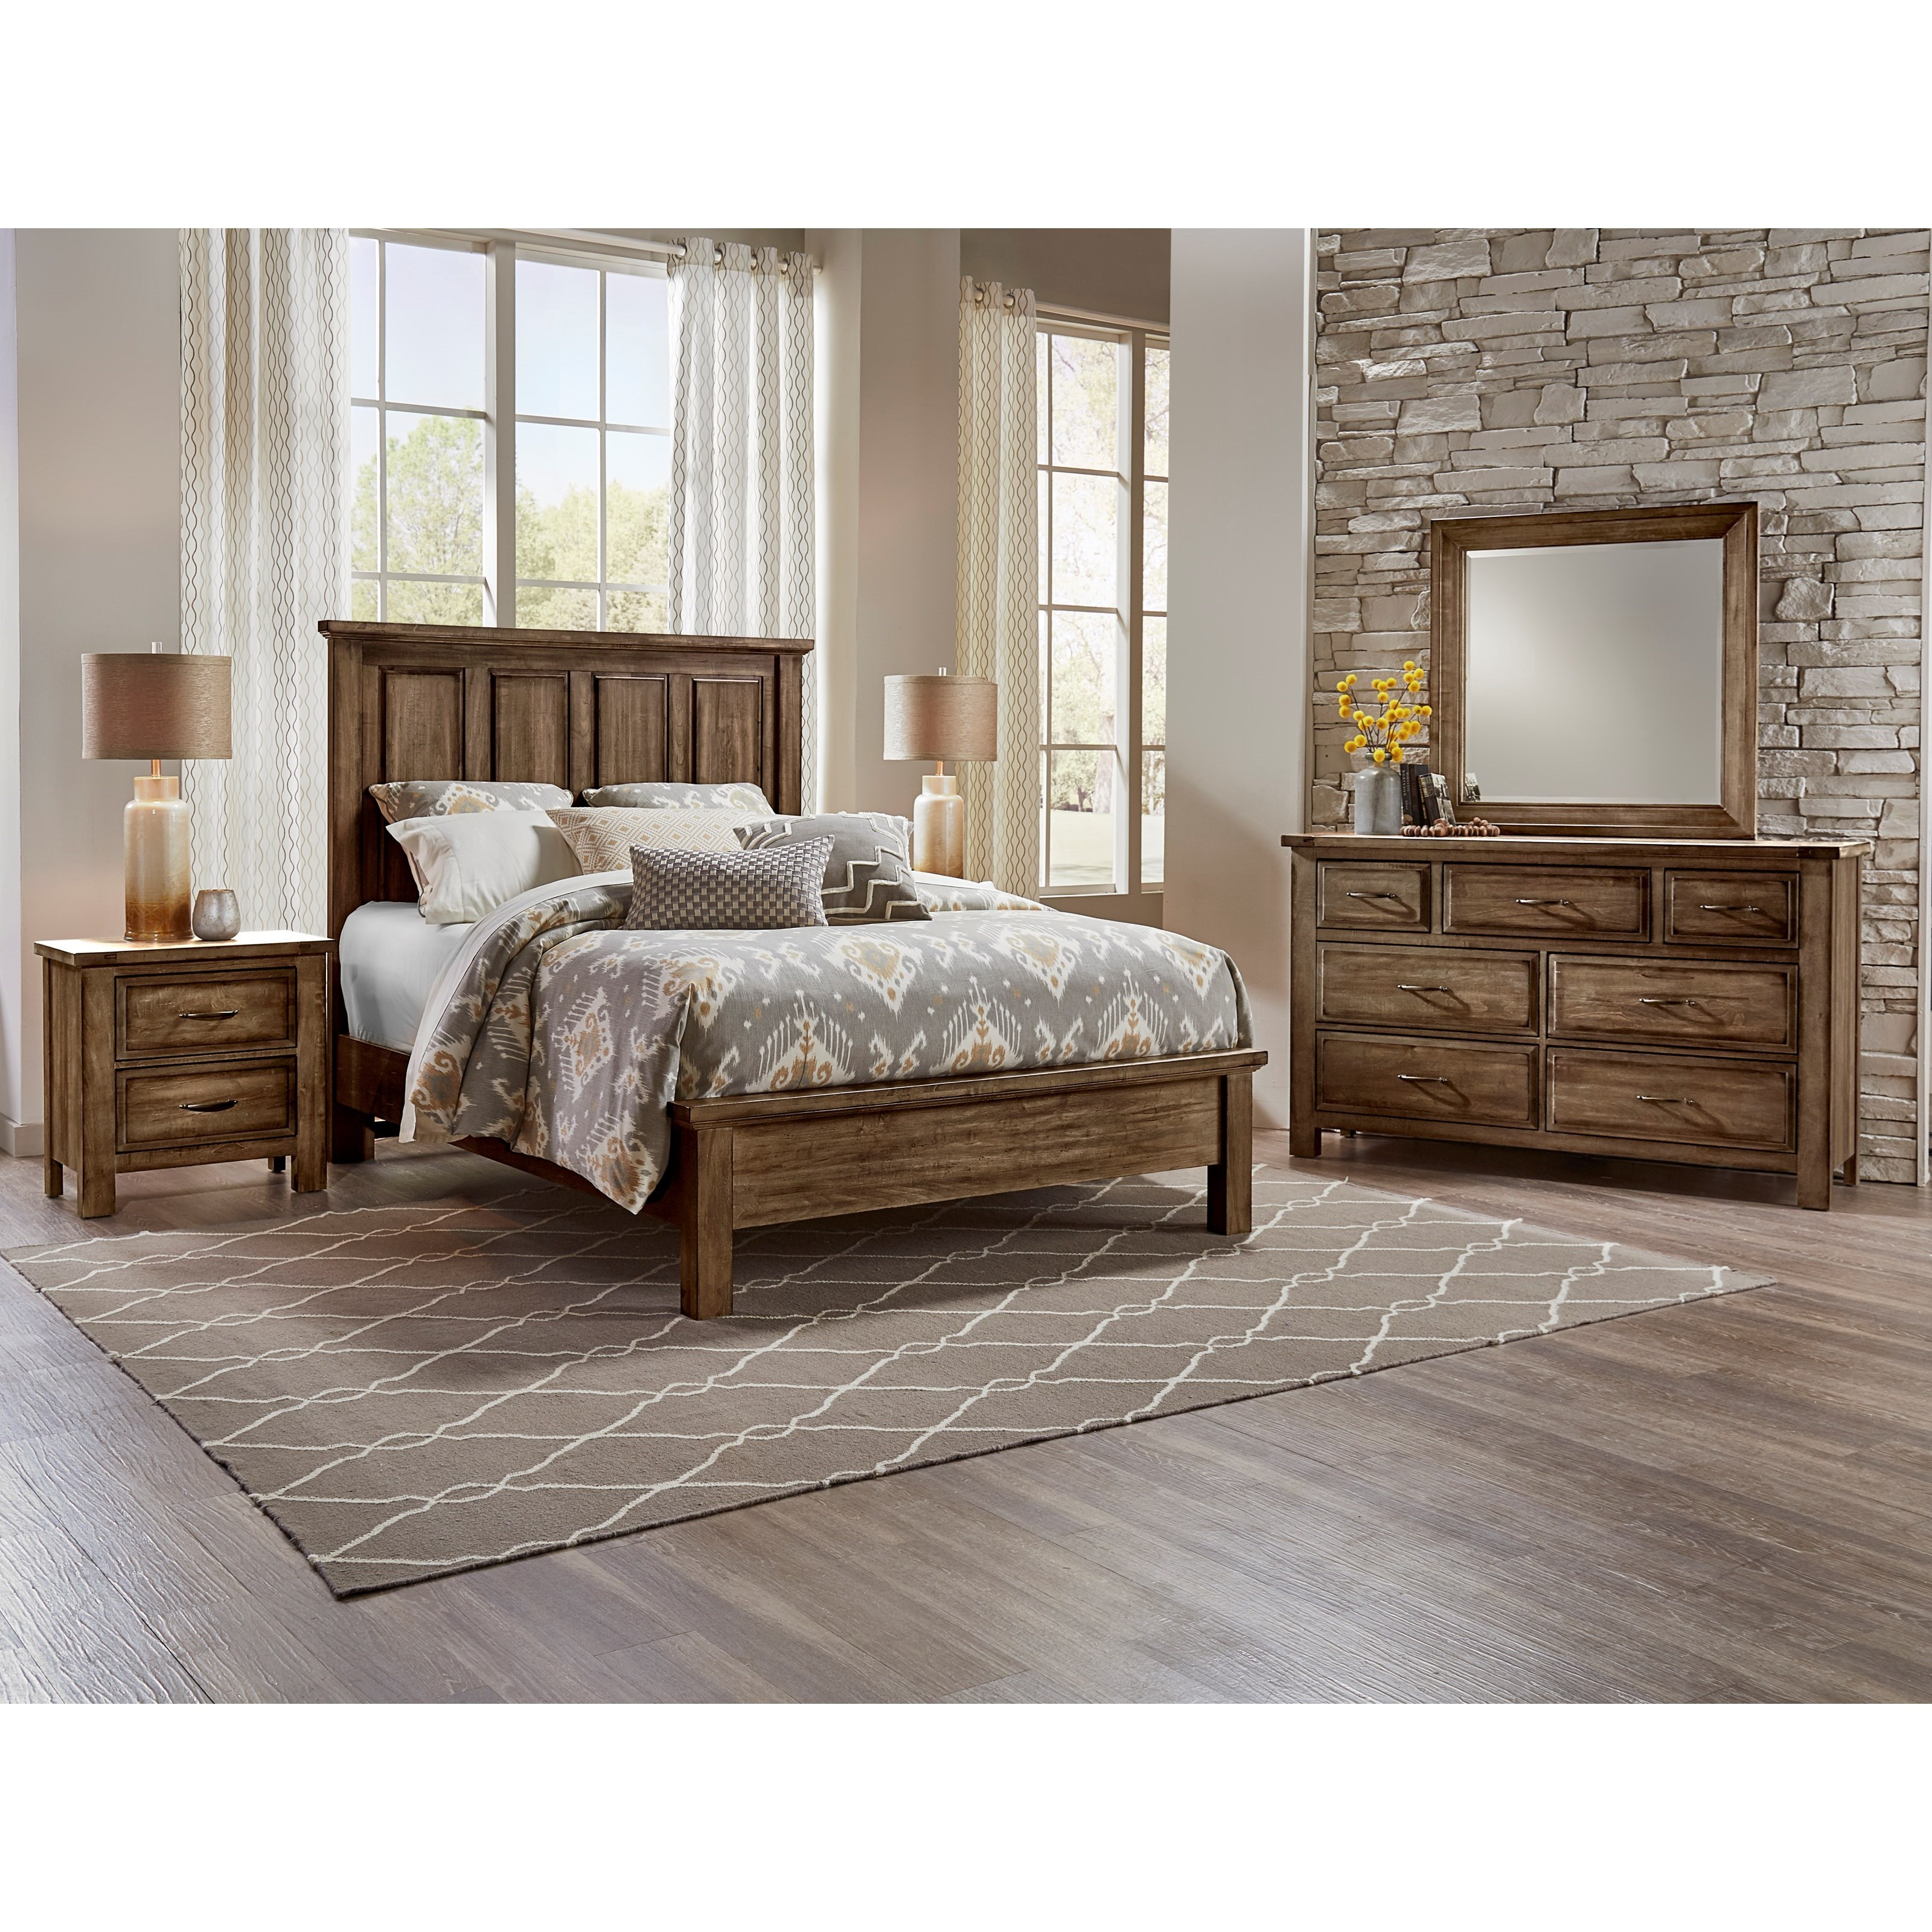 Artisan & Post Maple Road Queen Bedroom Group - Item Number: 117 Q Bedroom Group 1